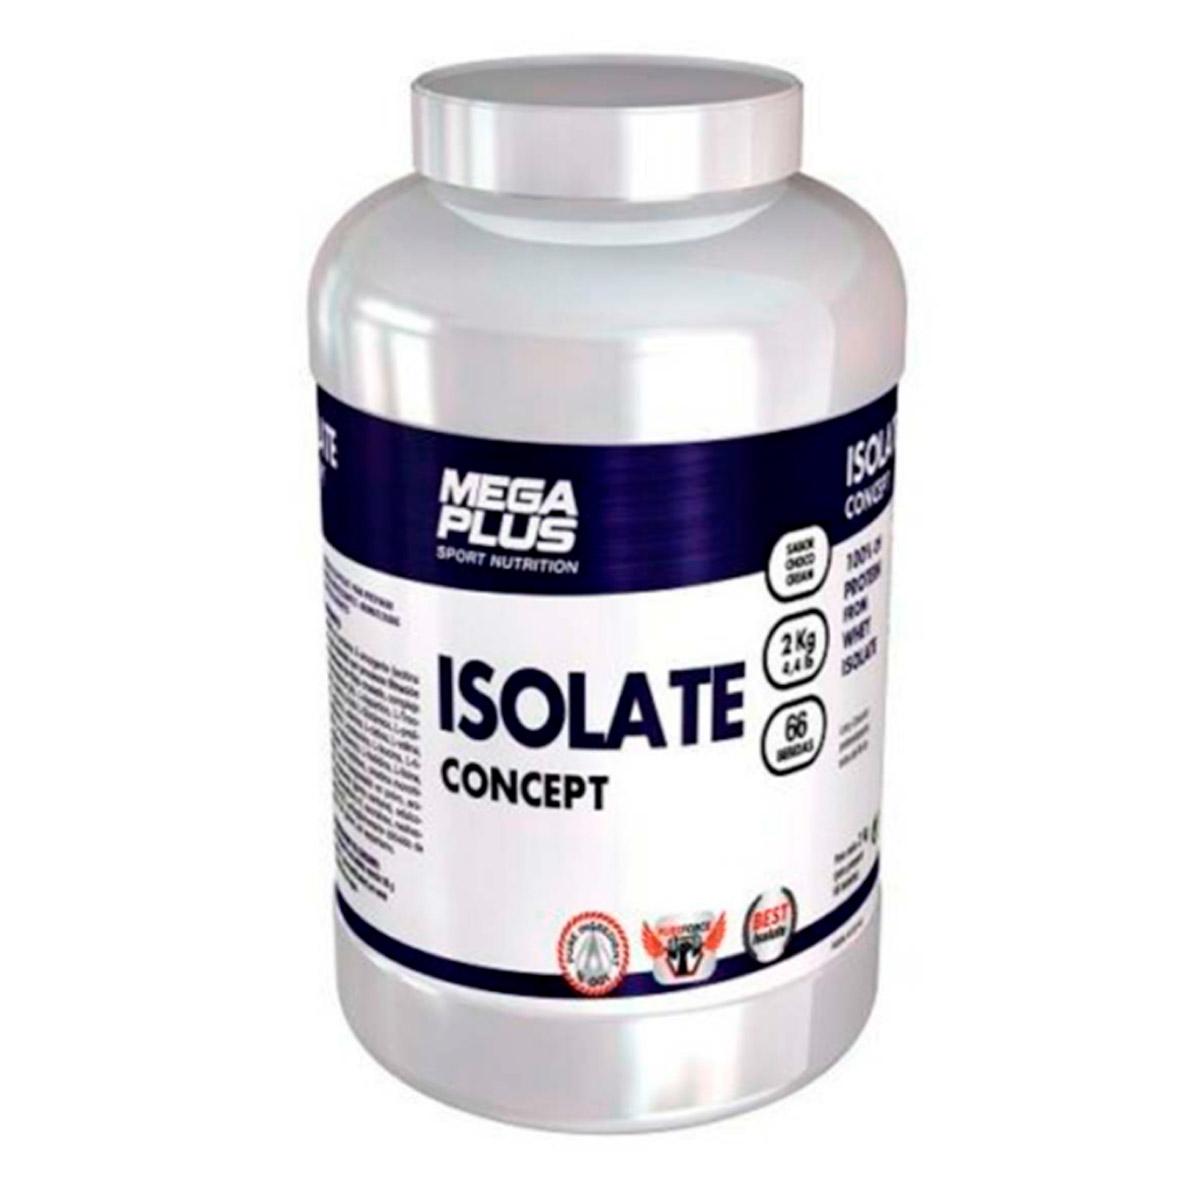 ISOLATE CONCEPT 1 kg. AISLADO DE PROTEINA + SHAKER - MEGAPLUS